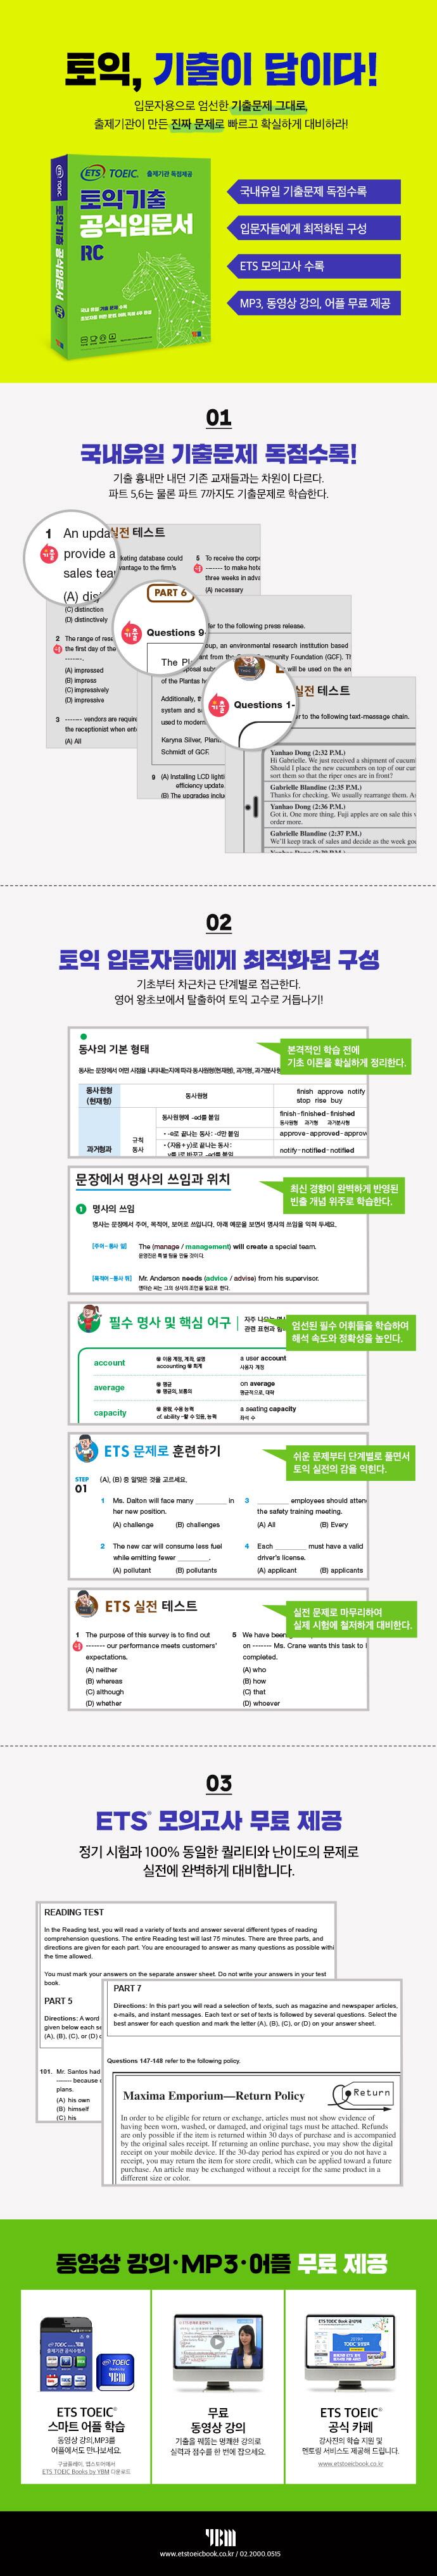 ETS 토익기출 공식입문서 RC 도서 상세이미지